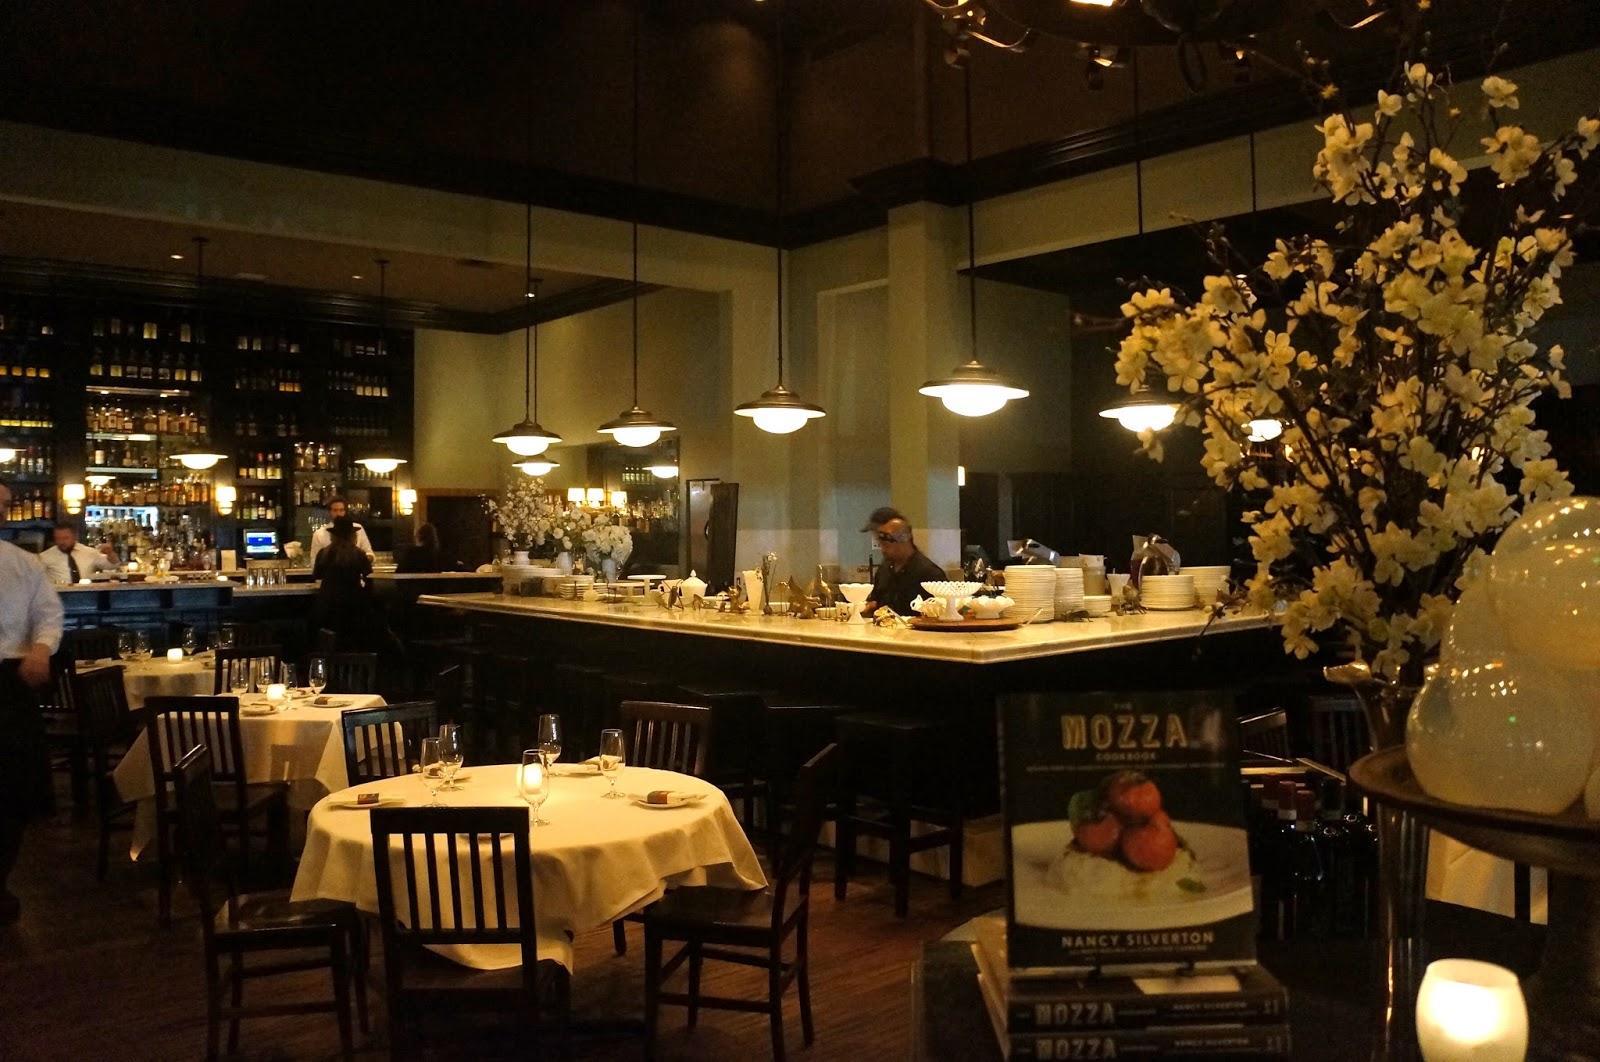 The Food Seeker: OSTERIA MOZZA (LOS ANGELES, CA)